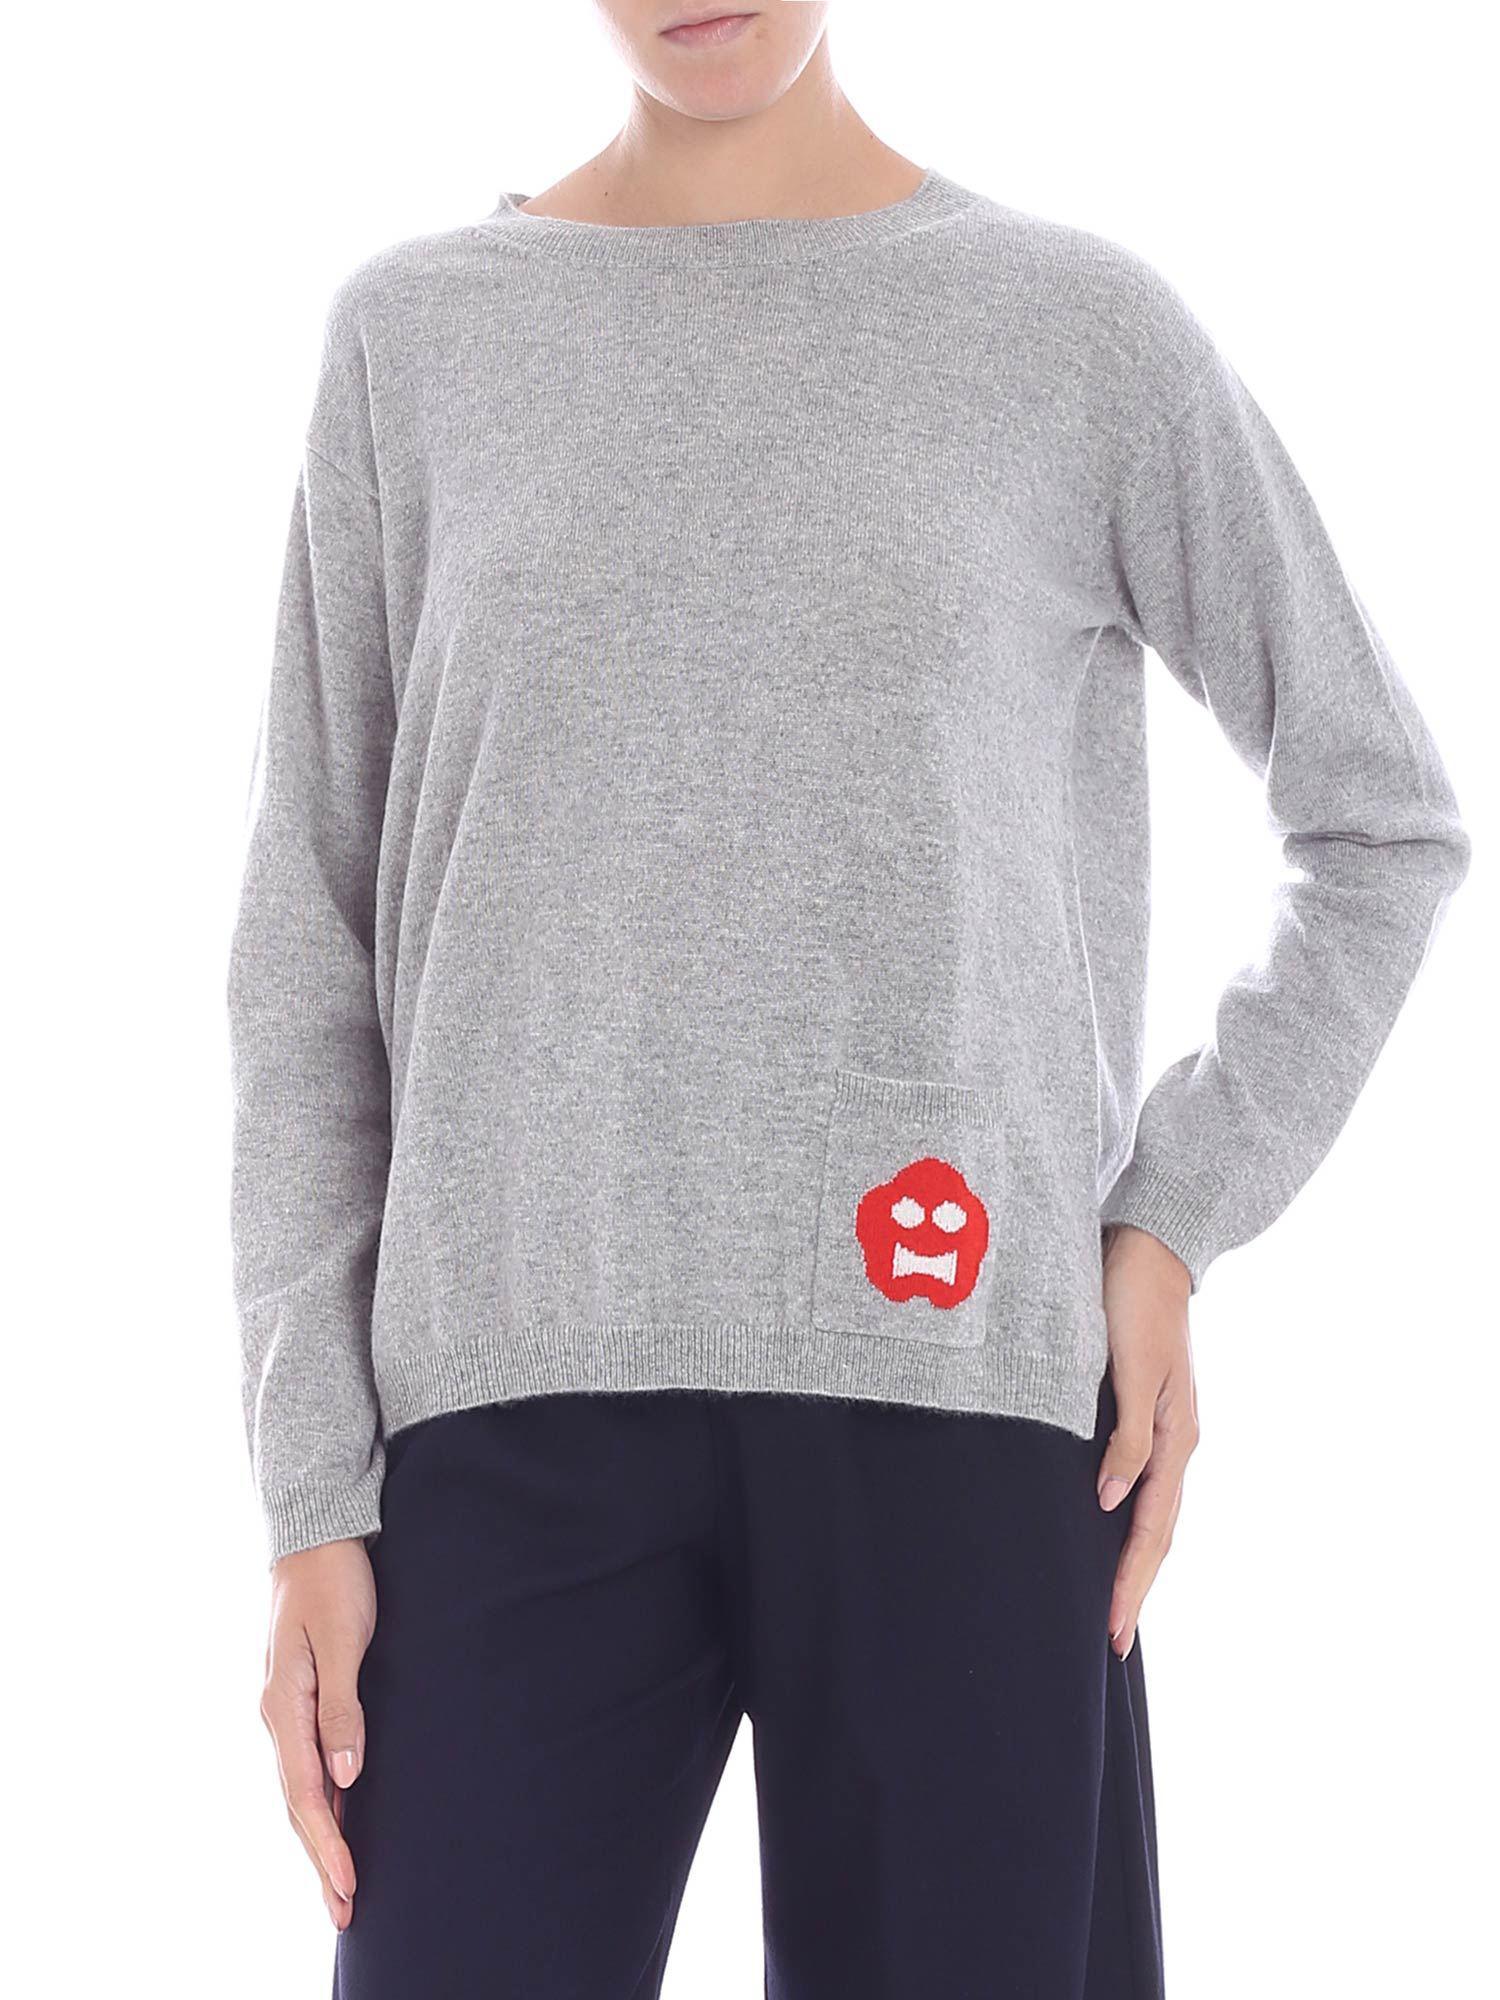 3c71e6aa Aspesi Grey Melange Cashmere Pullover in Gray - Lyst